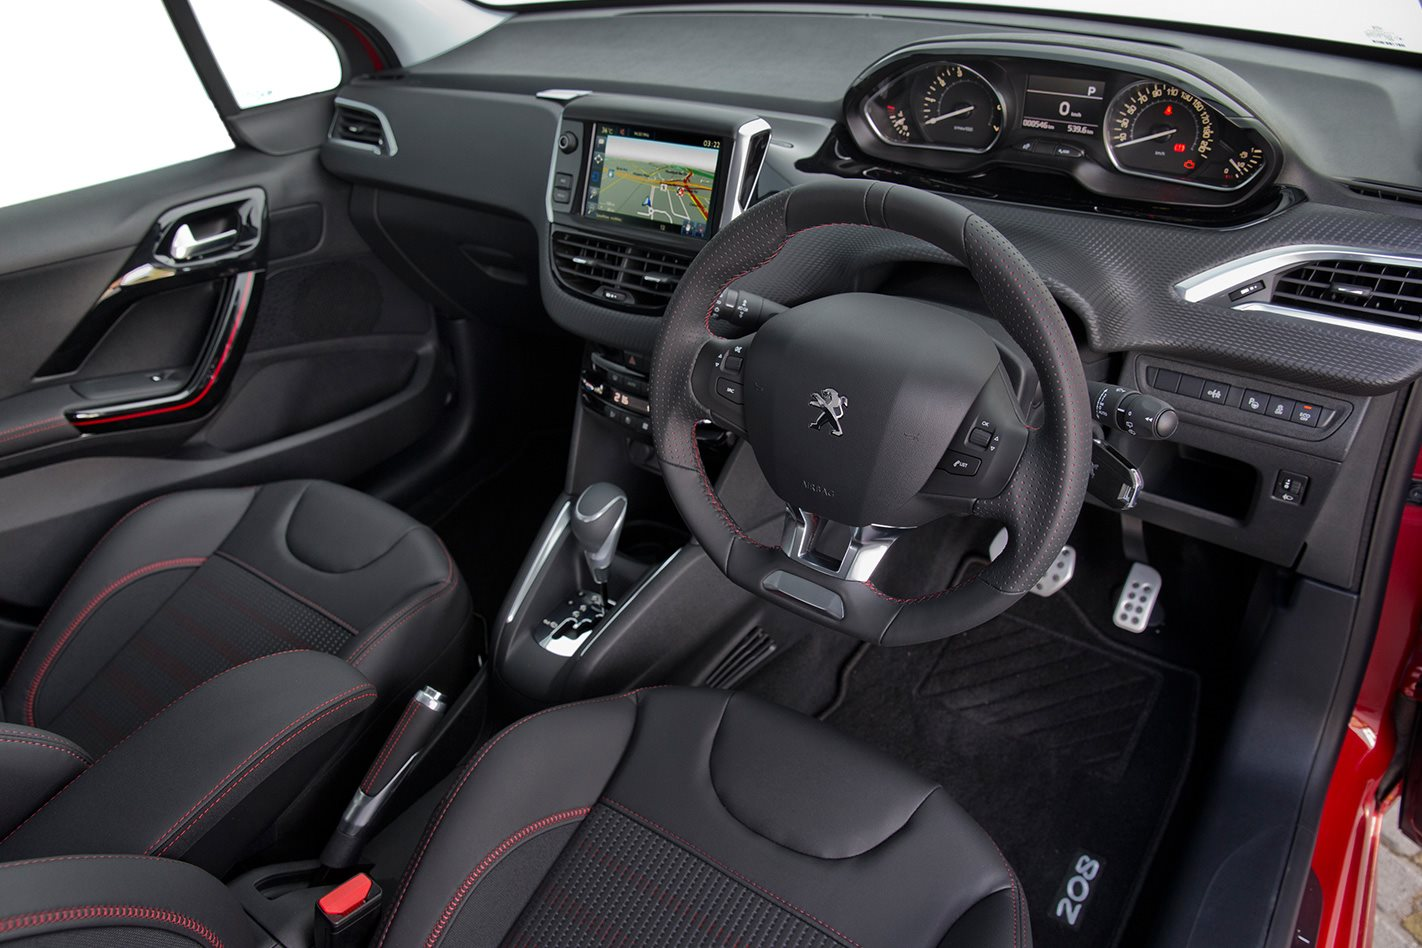 https://d3lp4xedbqa8a5.cloudfront.net/s3/digital-cougar-assets/whichcar/2016/07/22/-1/Peugeot-208-GT-line-interior-(1).jpg